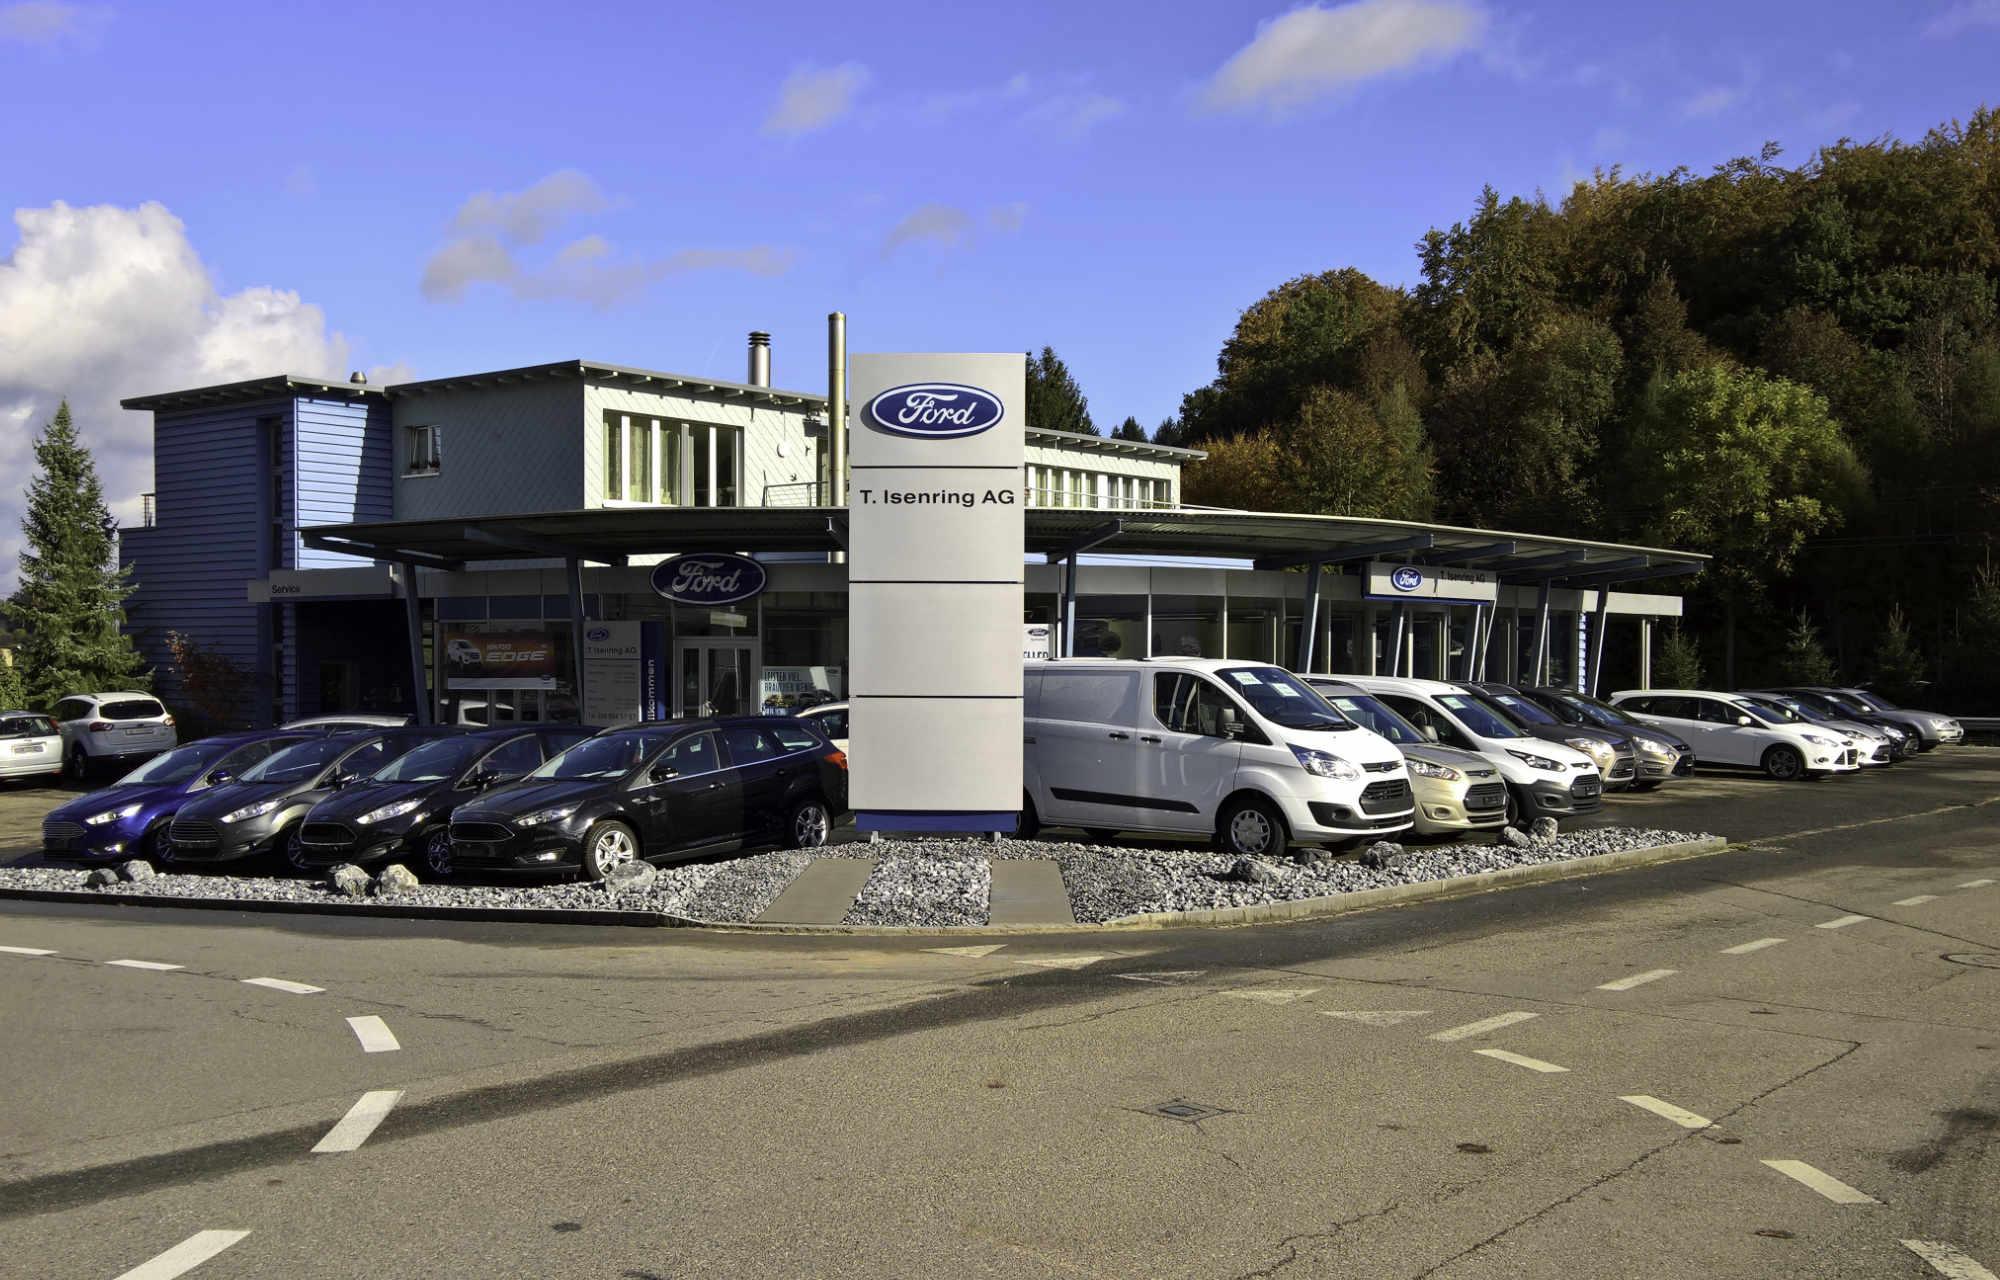 Unser Betrieb Garage T. Isenring AG